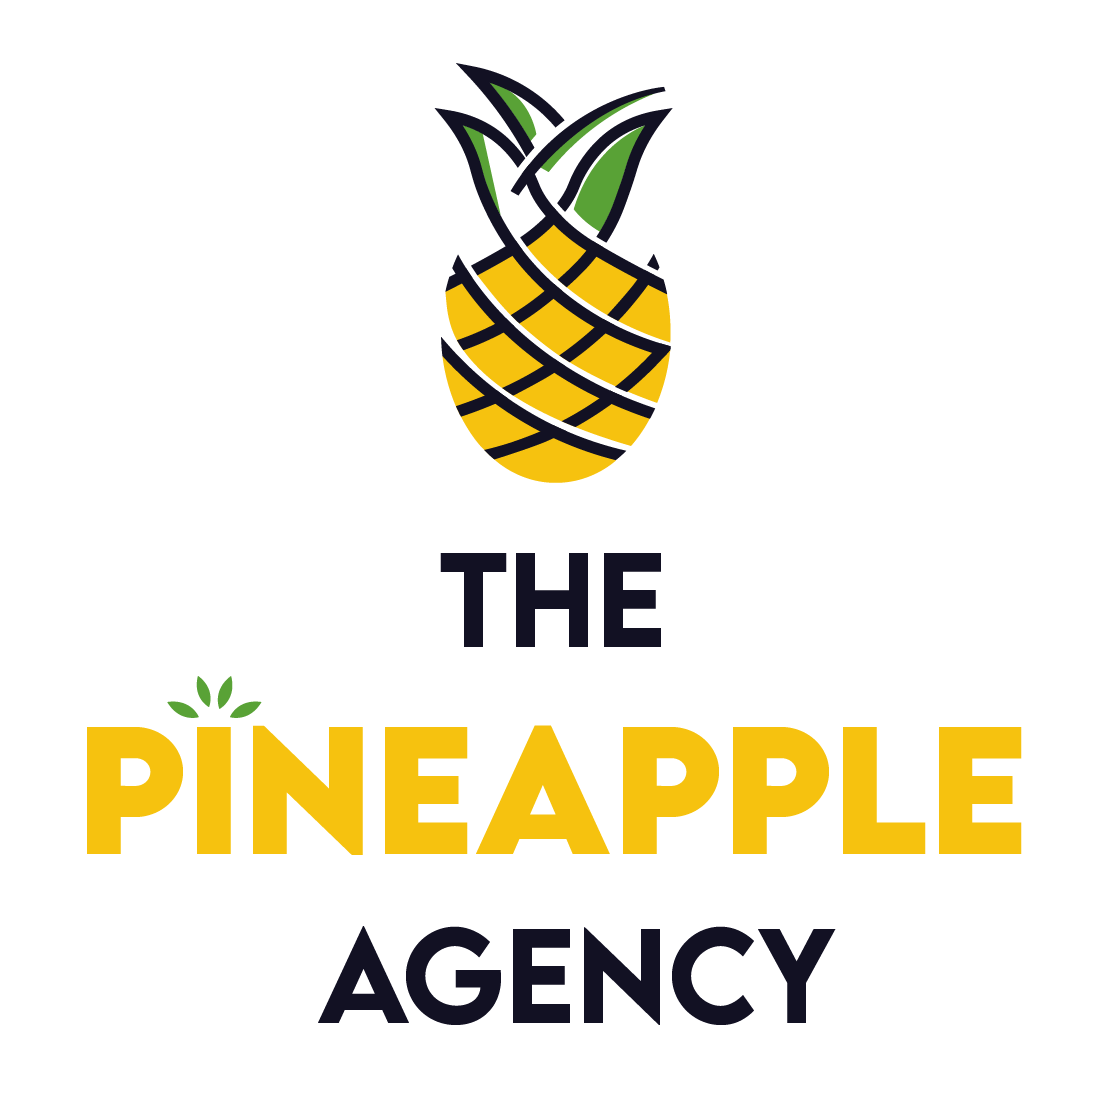 The Pineapple Agency Logo